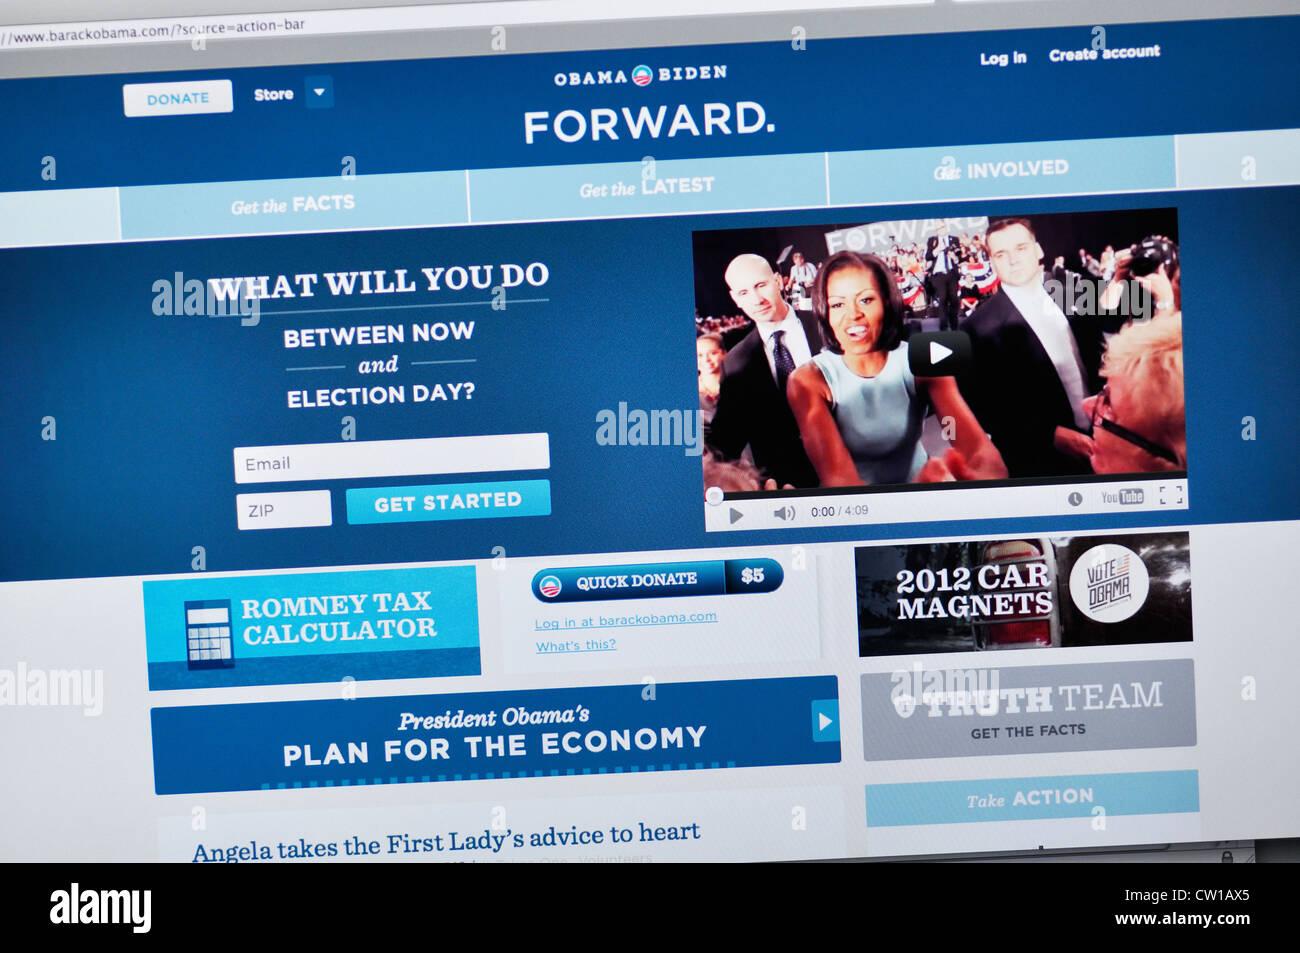 Barack Obama website - Stock Image